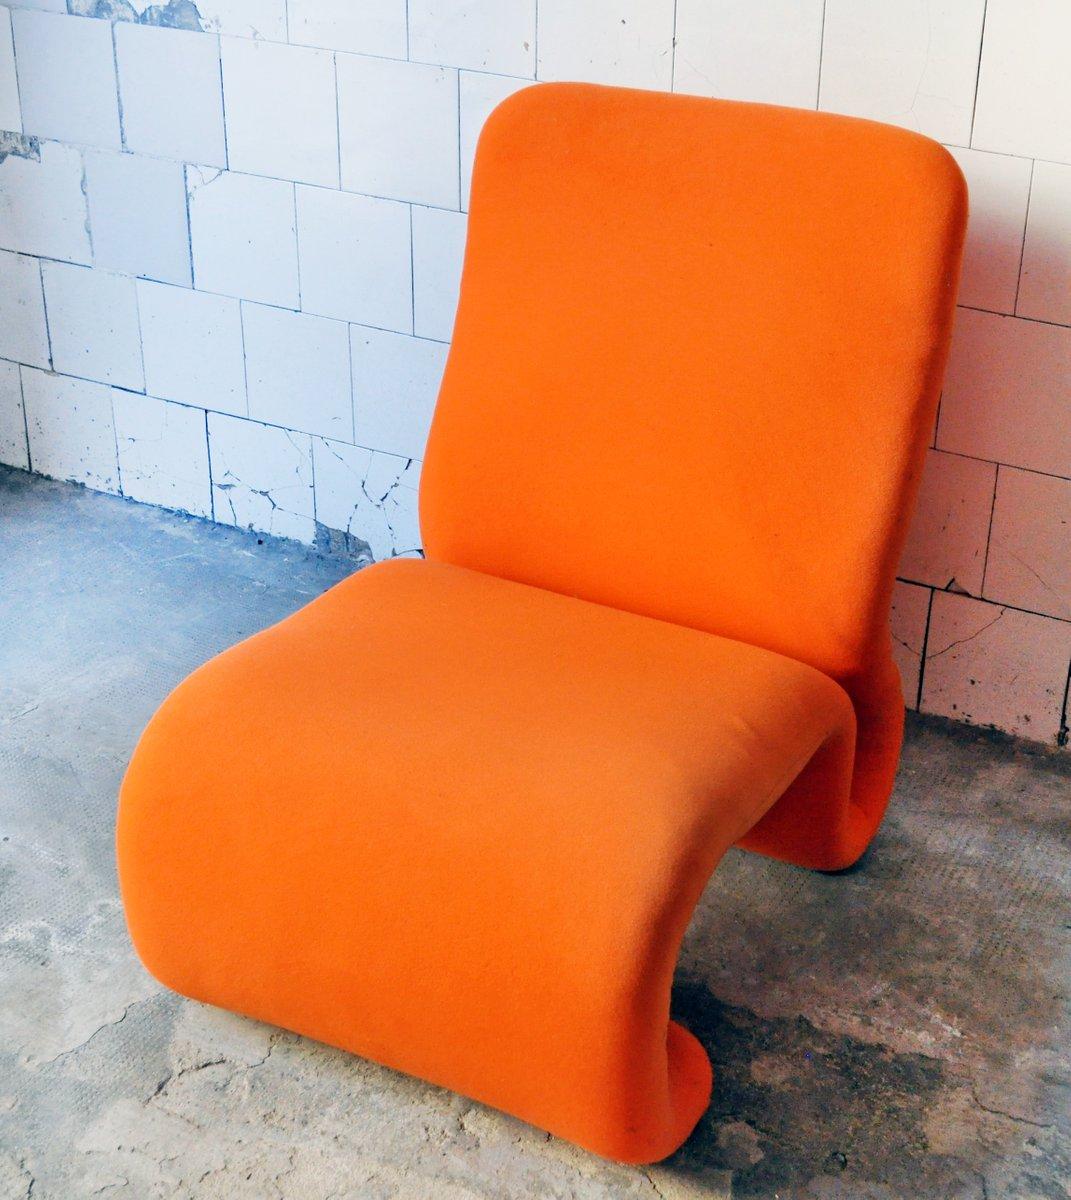 vintage sessel von jan ekselius bei pamono kaufen. Black Bedroom Furniture Sets. Home Design Ideas